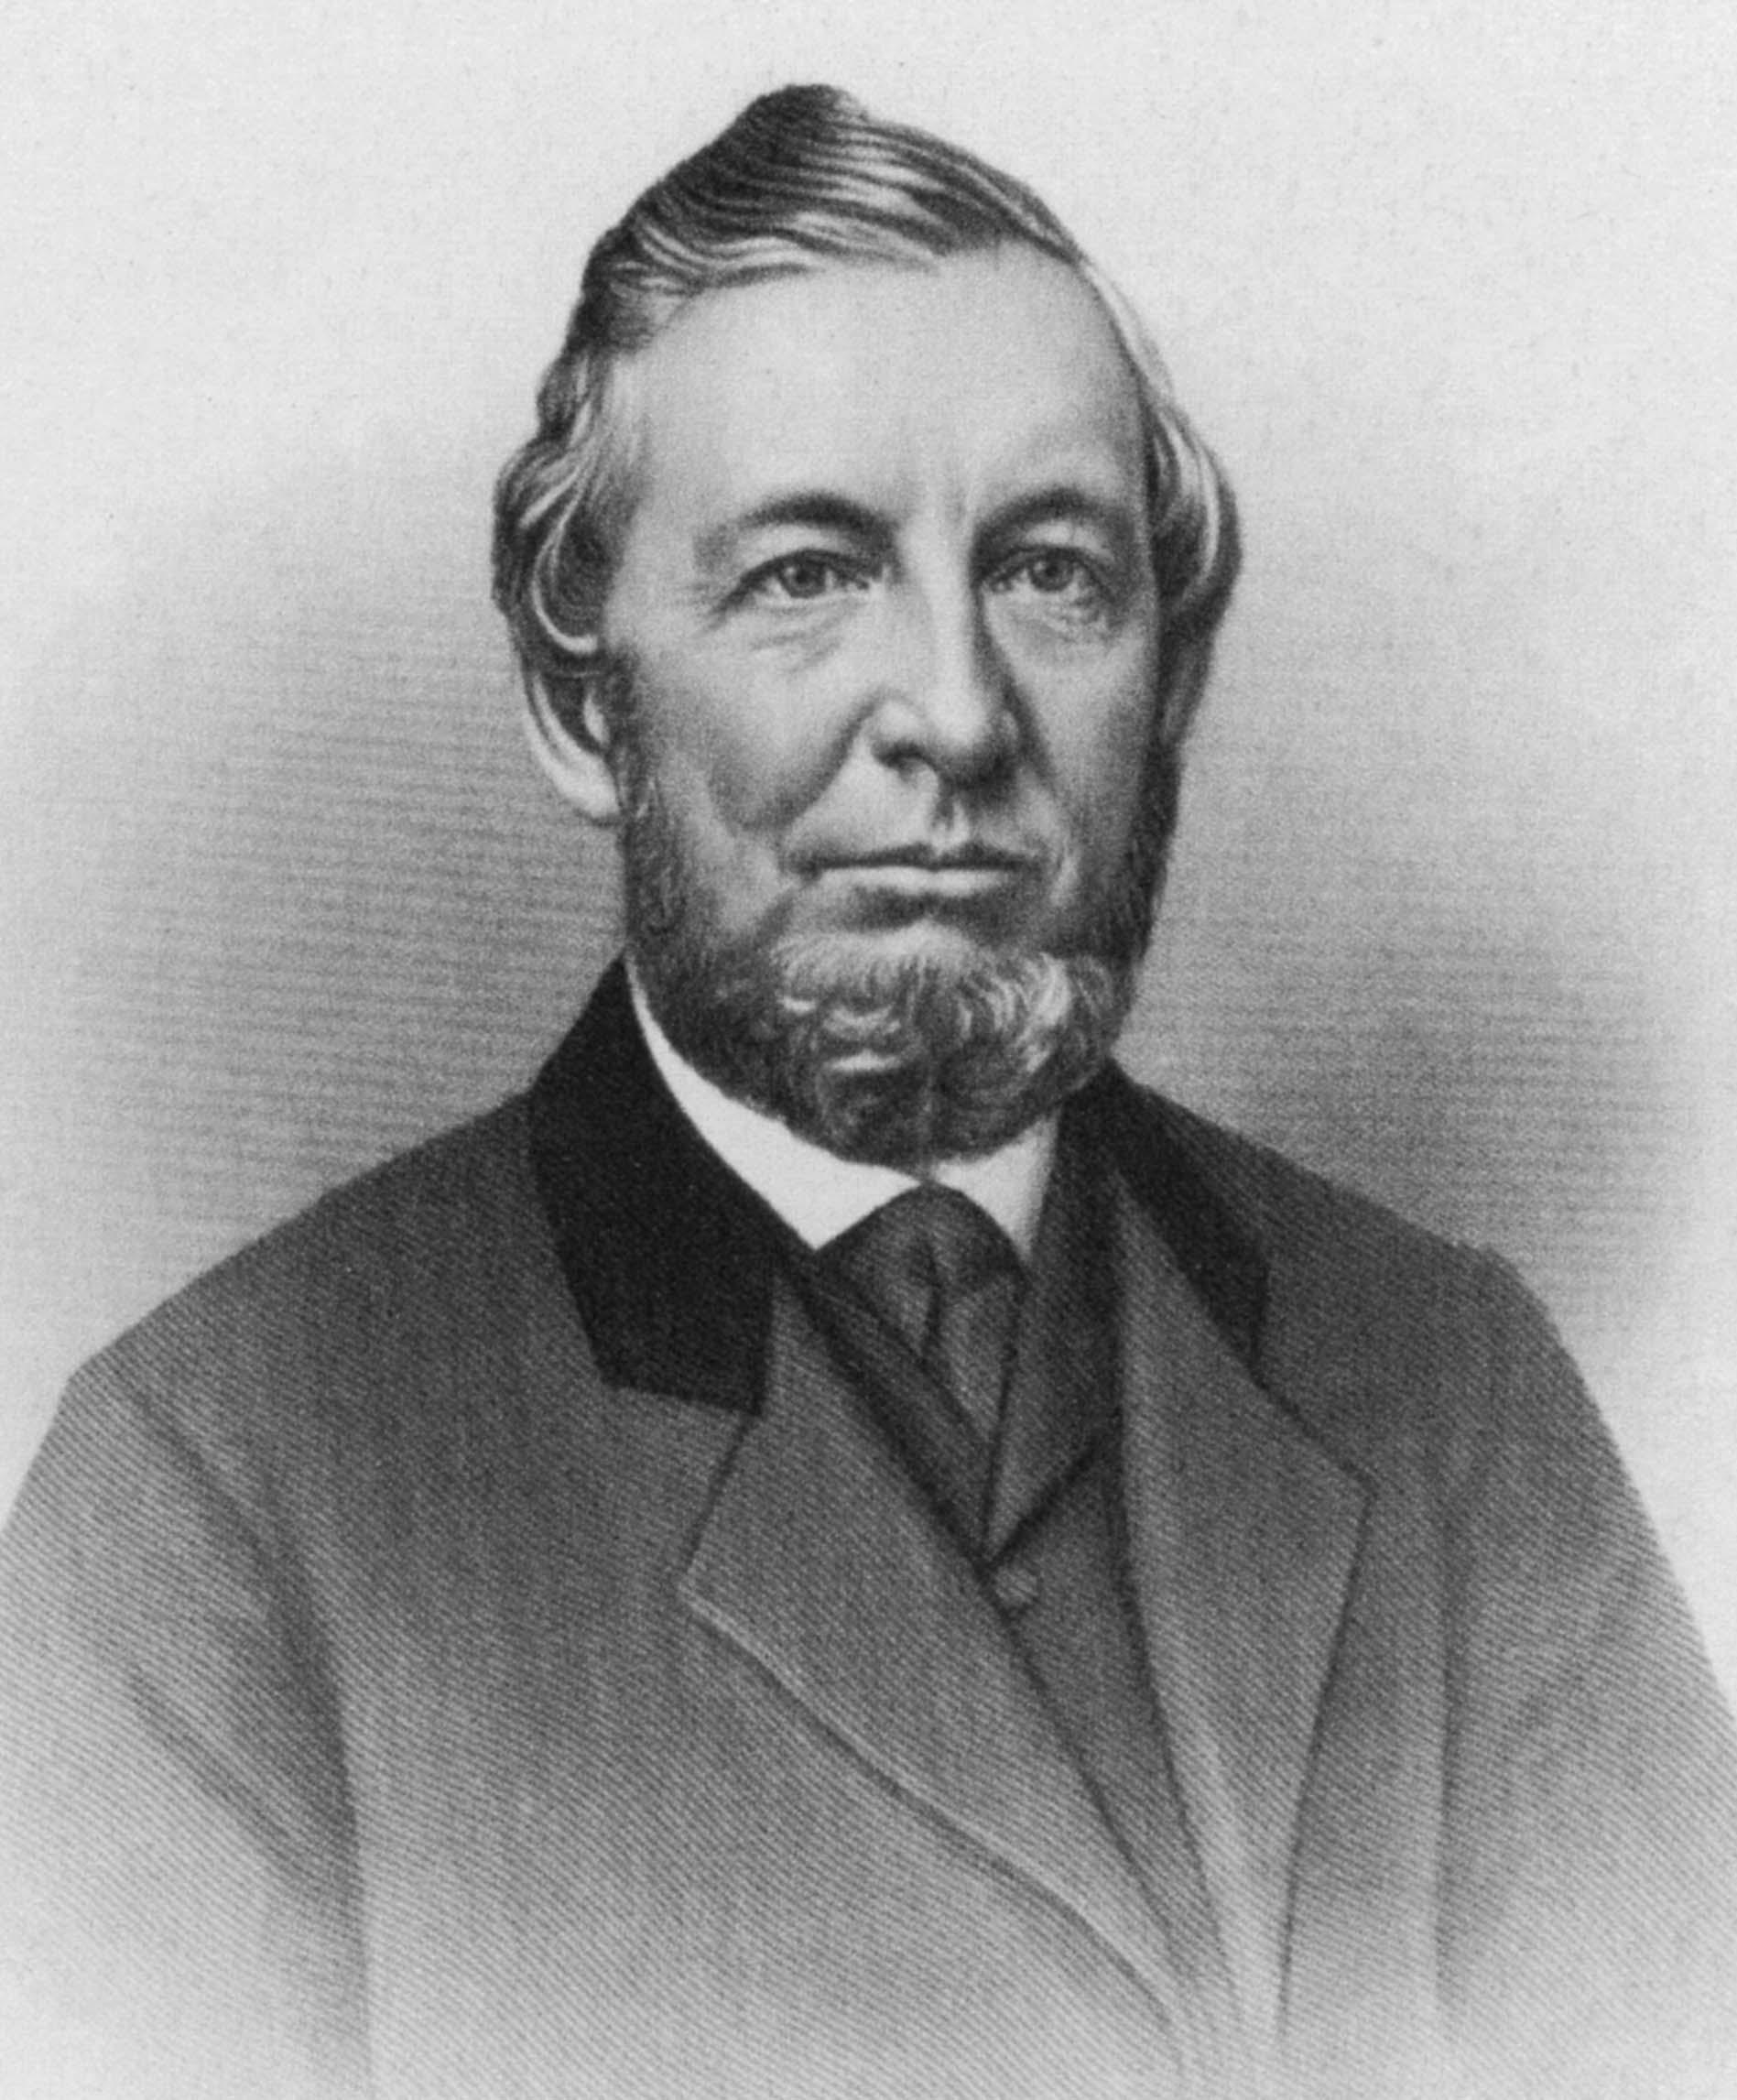 Horace Talcott